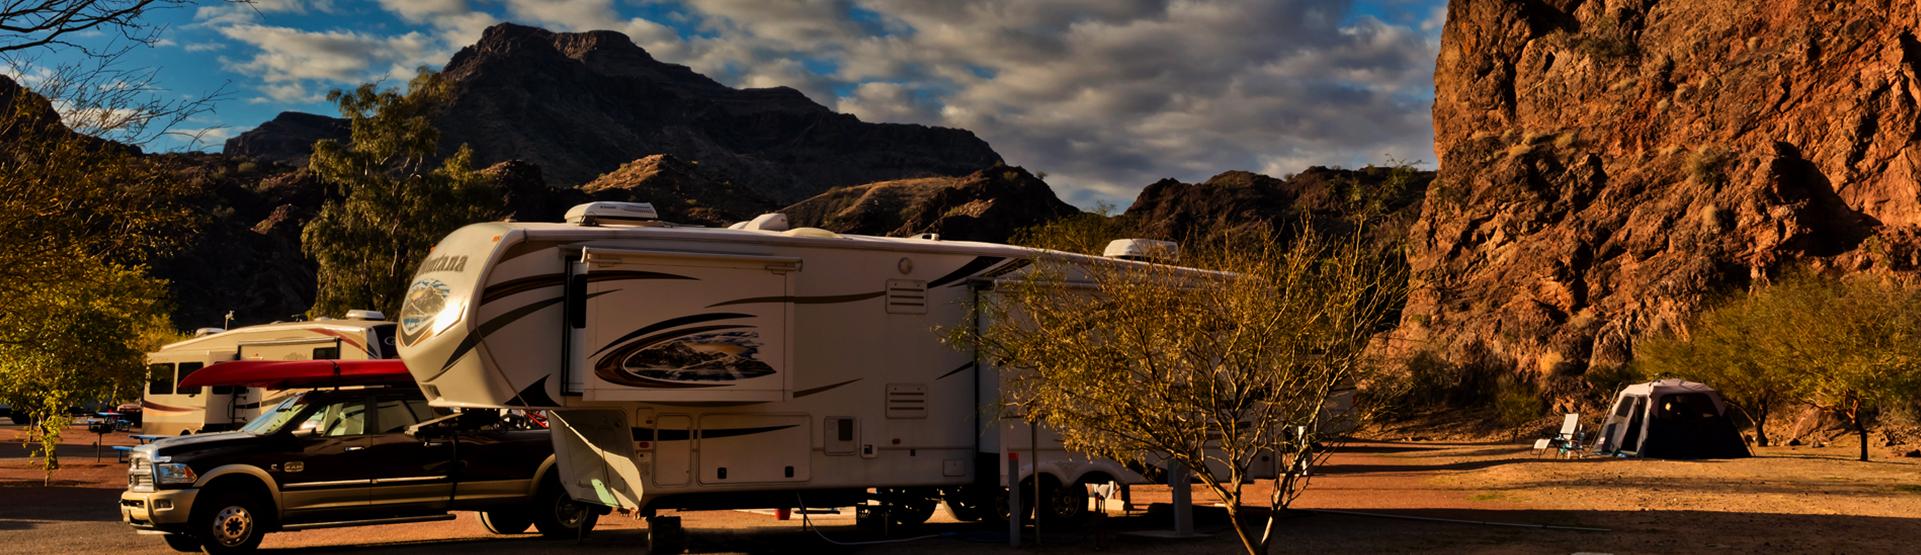 Arizona RV Camping | Arizona State Parks